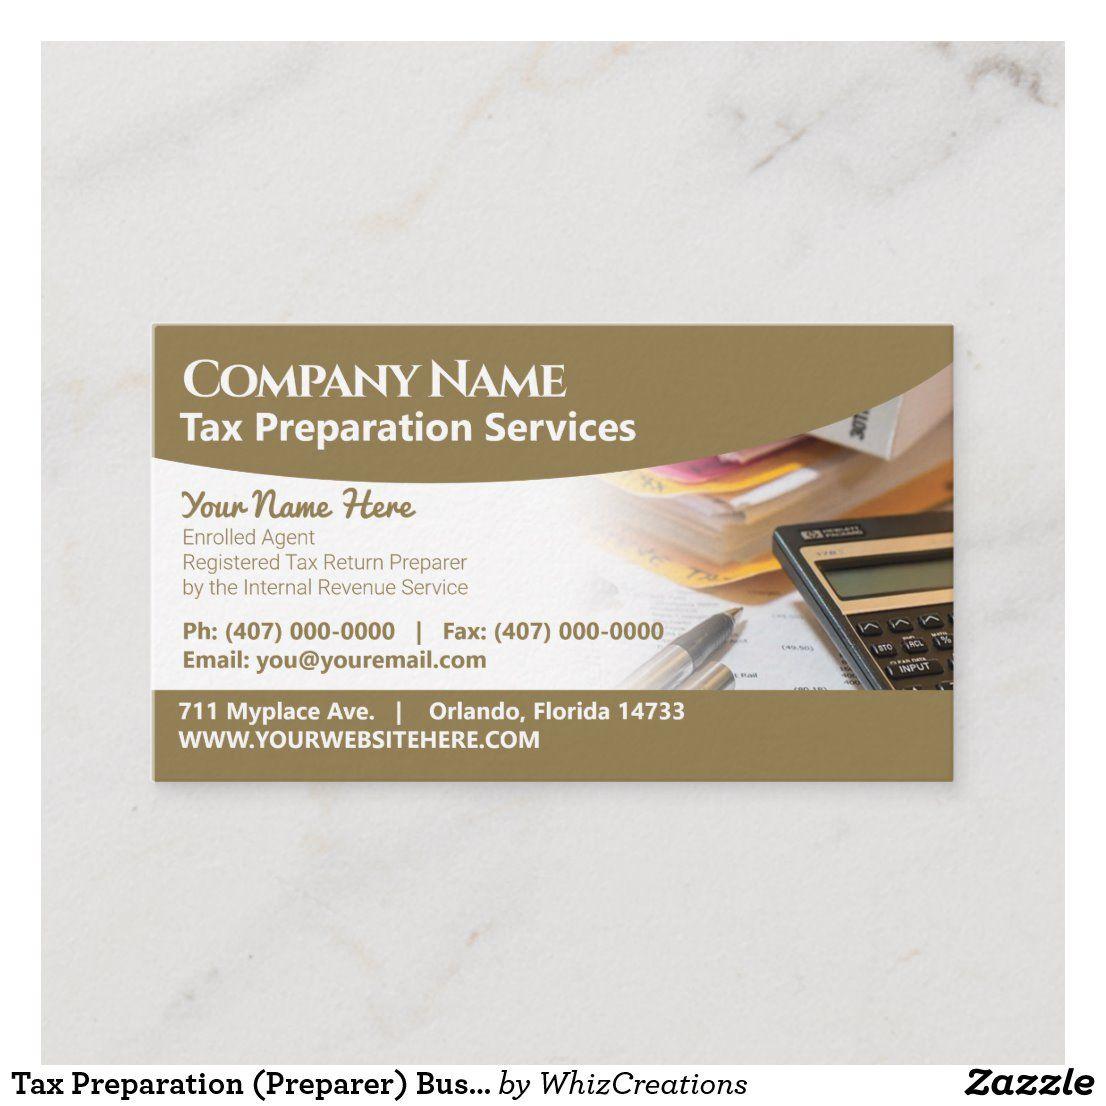 Tax Preparation Preparer Business Card Zazzle Com Tax Preparation Preparation Business Cards